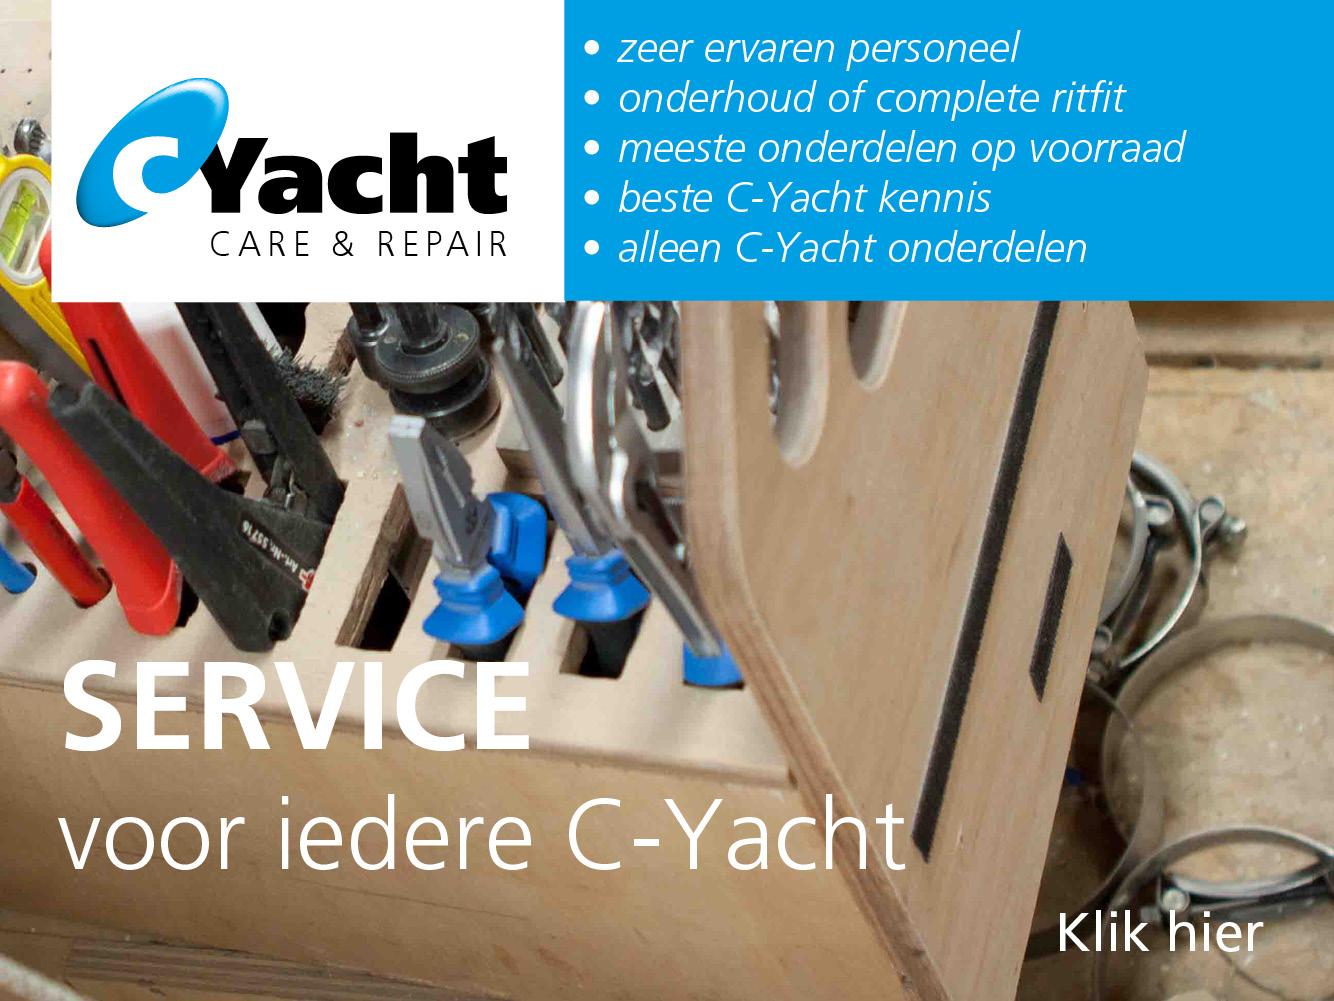 service-c-yacht-care-repair